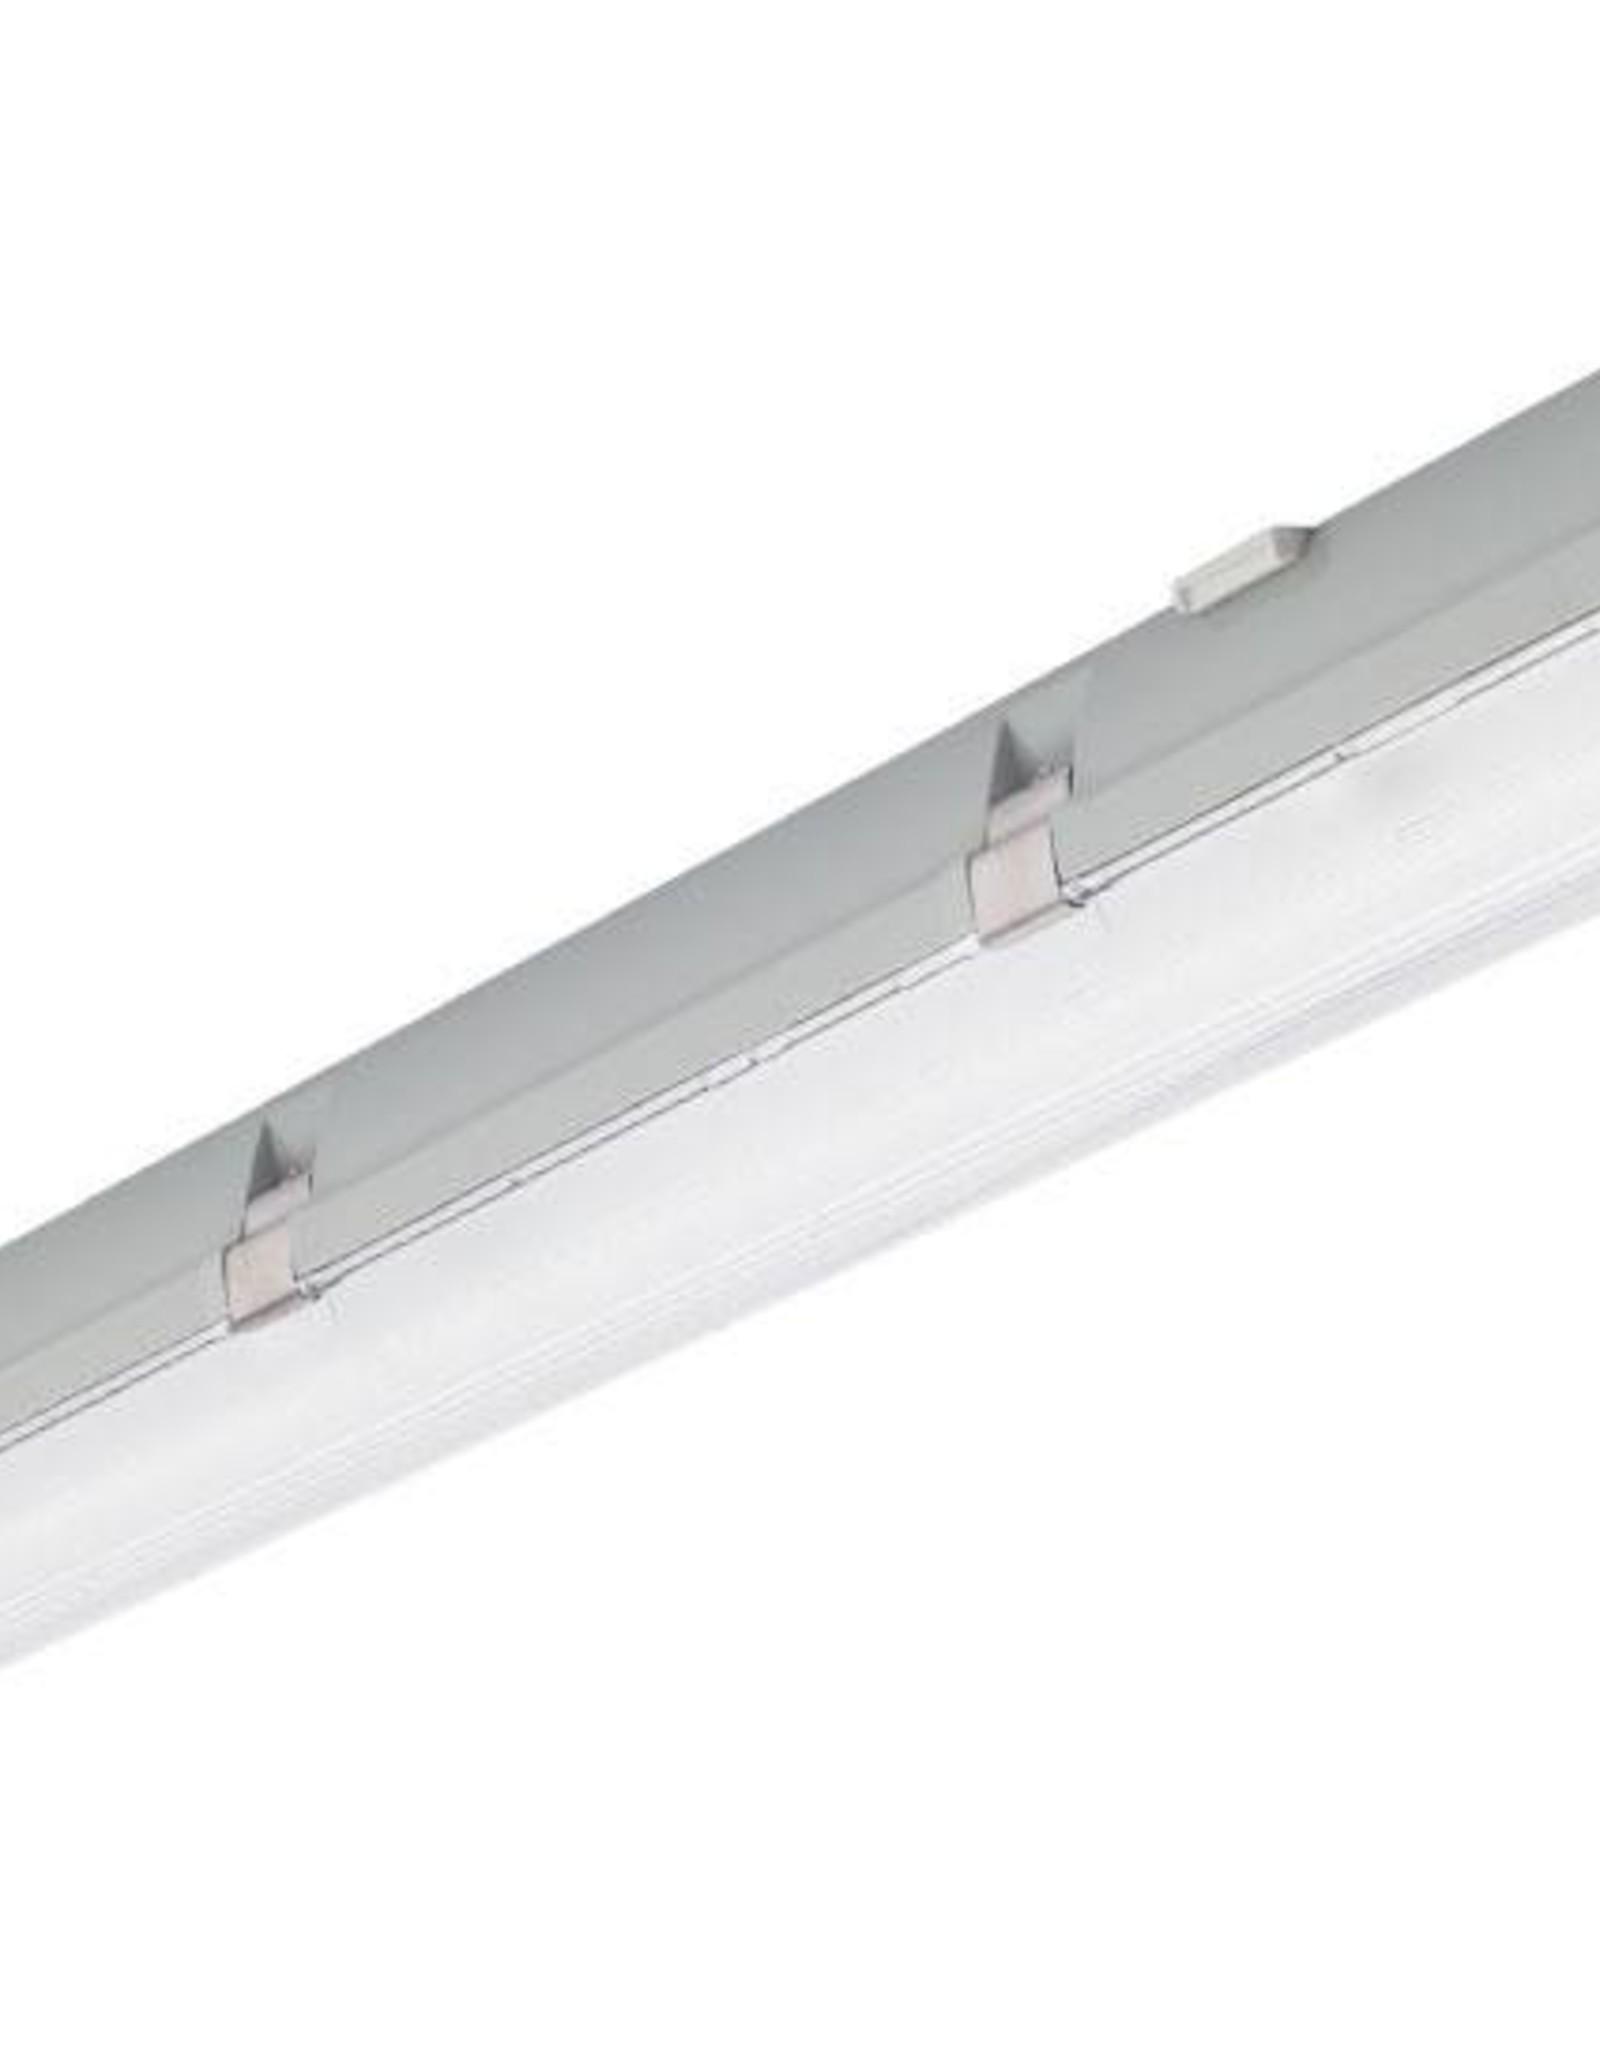 Prima 1x35W HE - ABS - inox clips - HF ballast